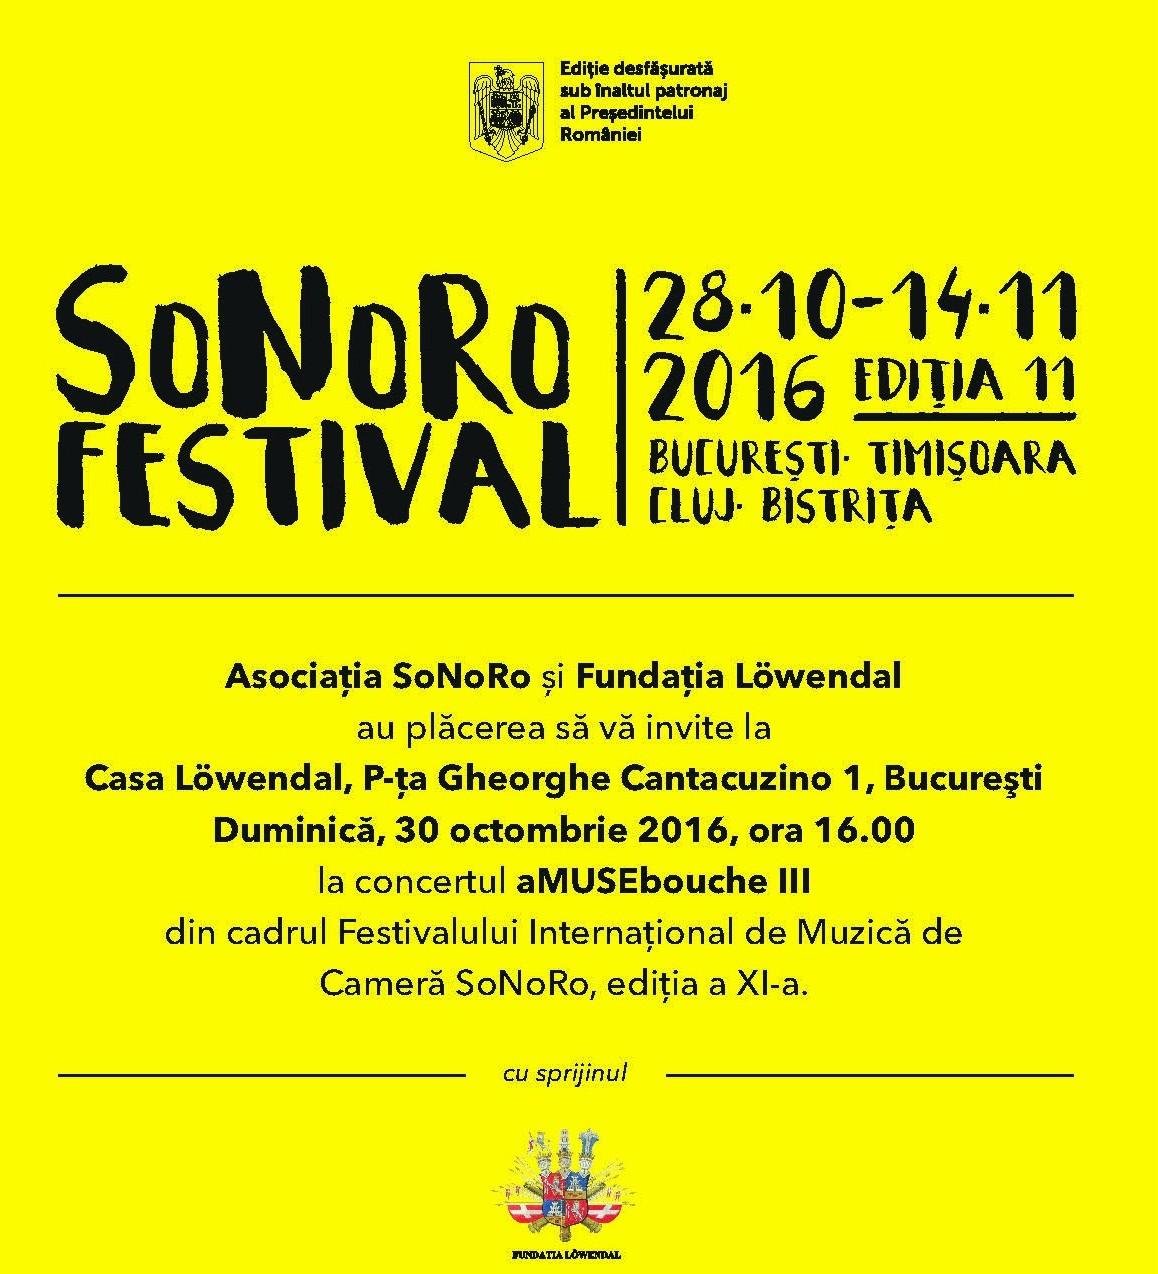 Concertul aMUSEbouche III: Sonoro Festival@Fundația Löwendal